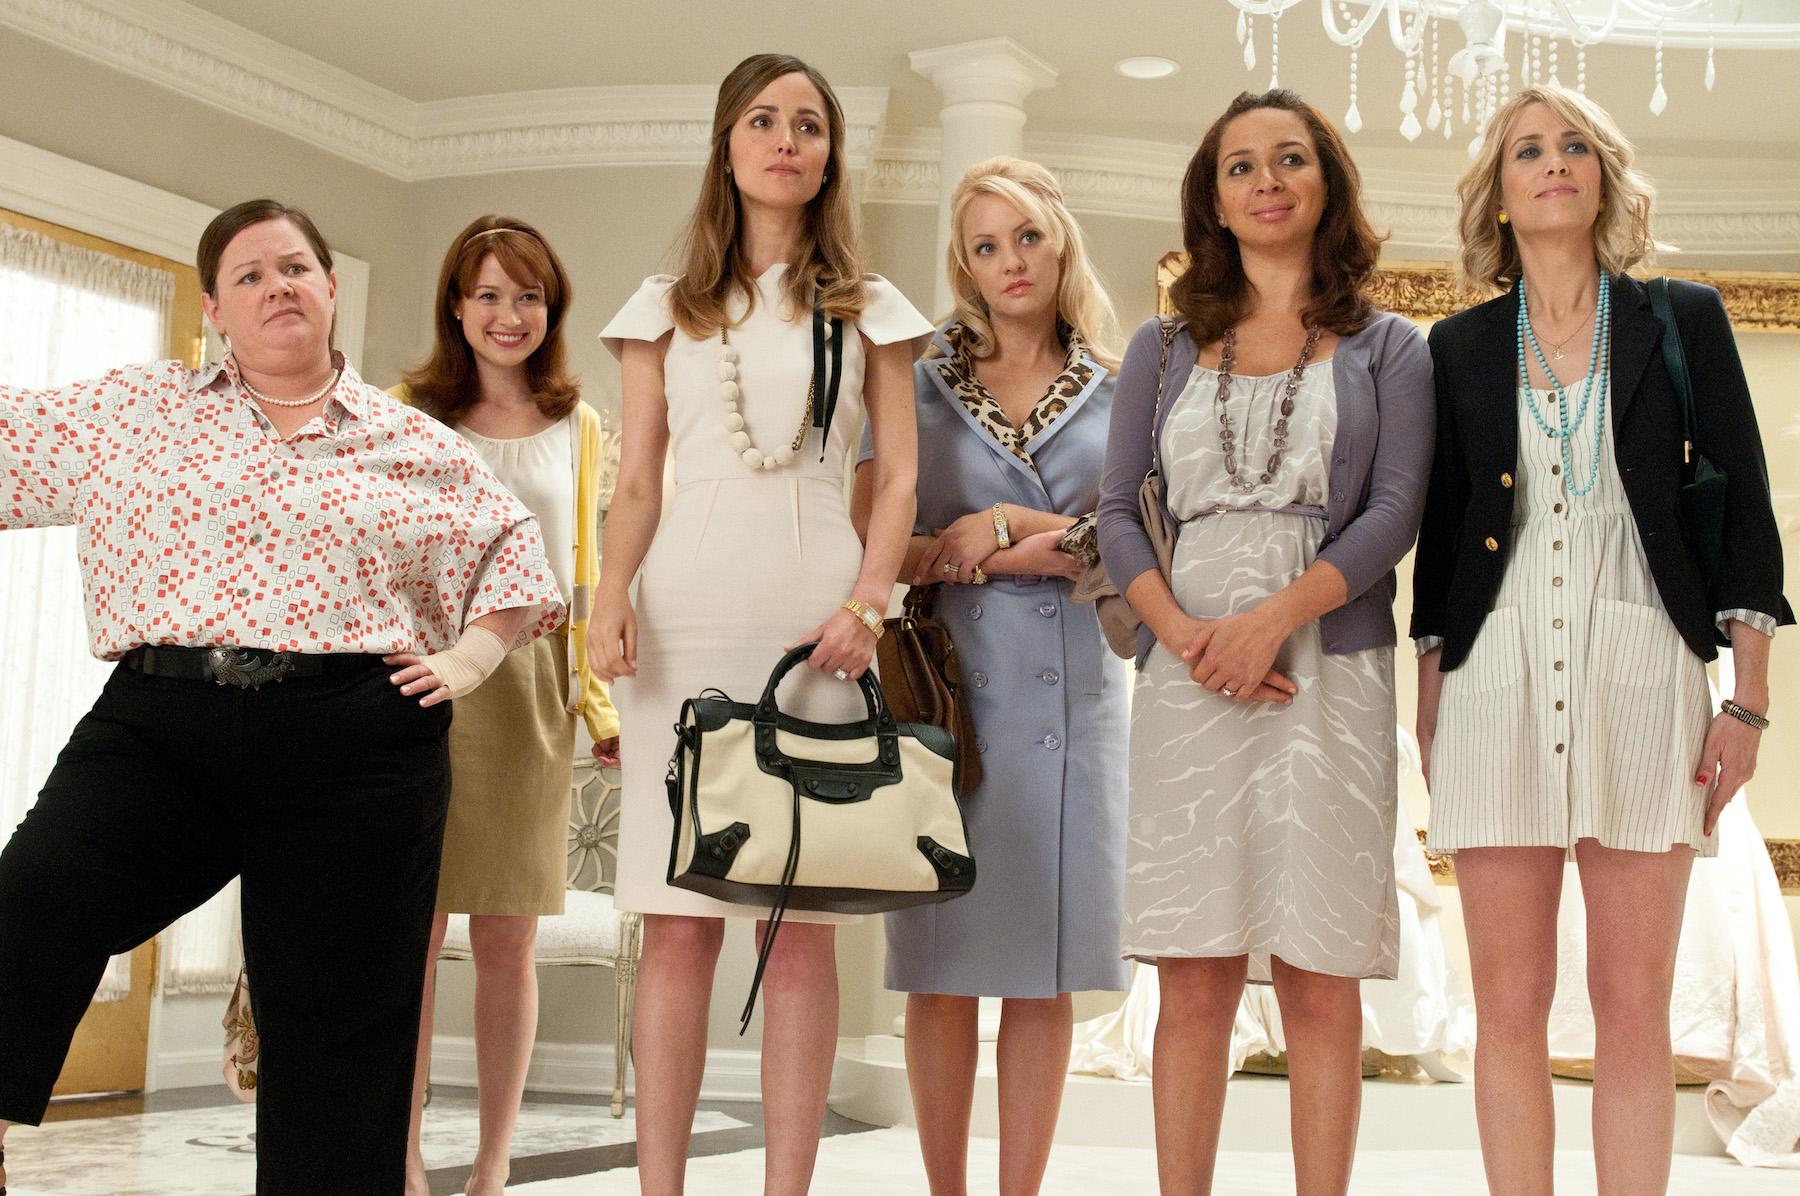 Six leading women of Bridesmaids